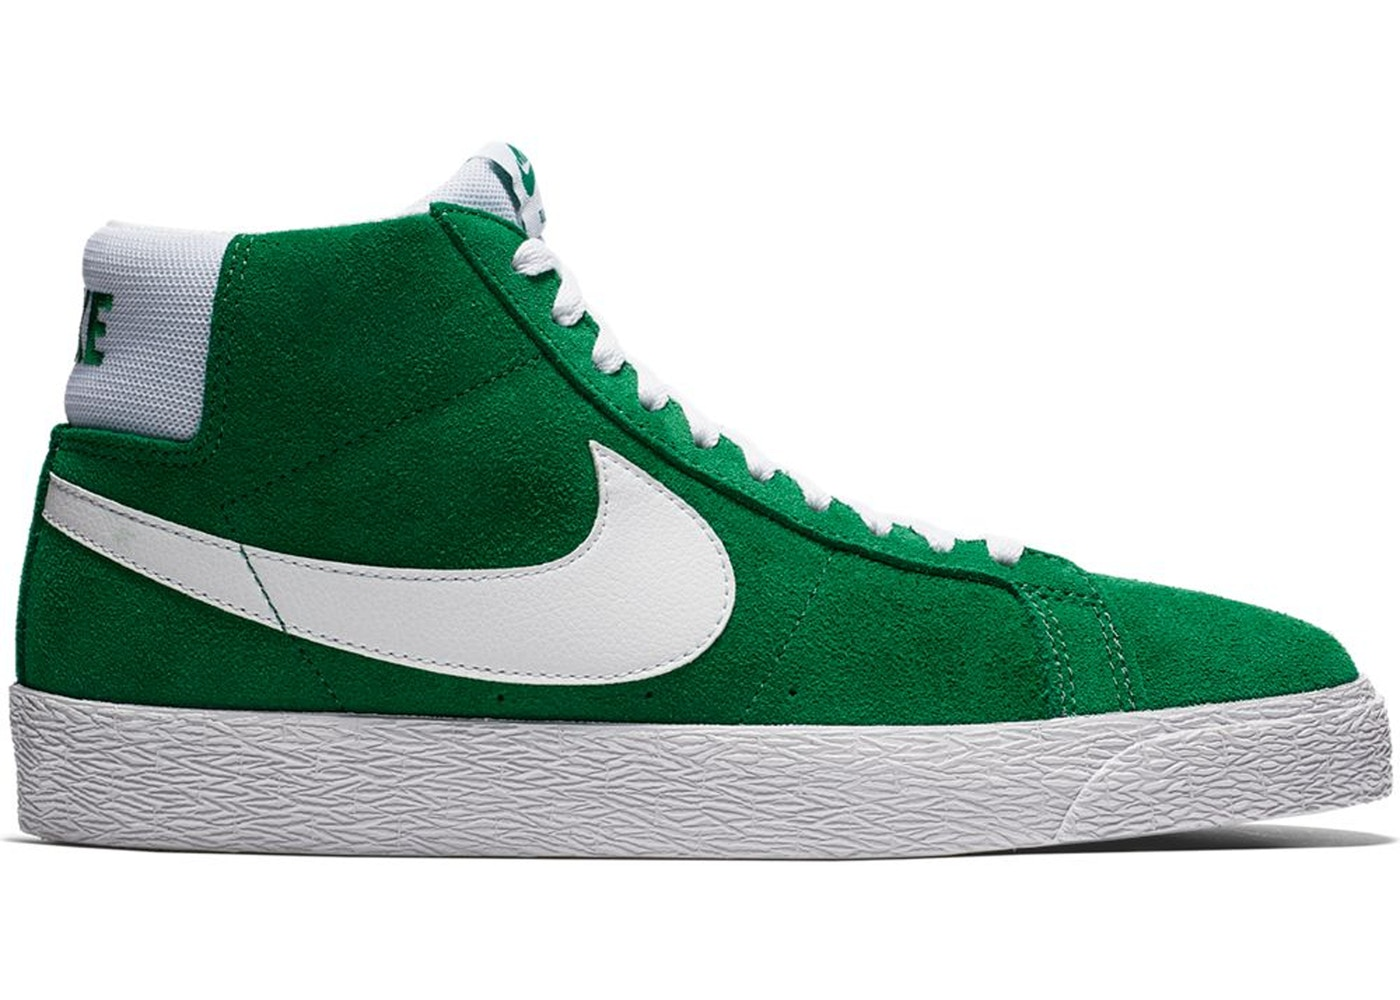 Nike SB Blazer Mid Pine Green